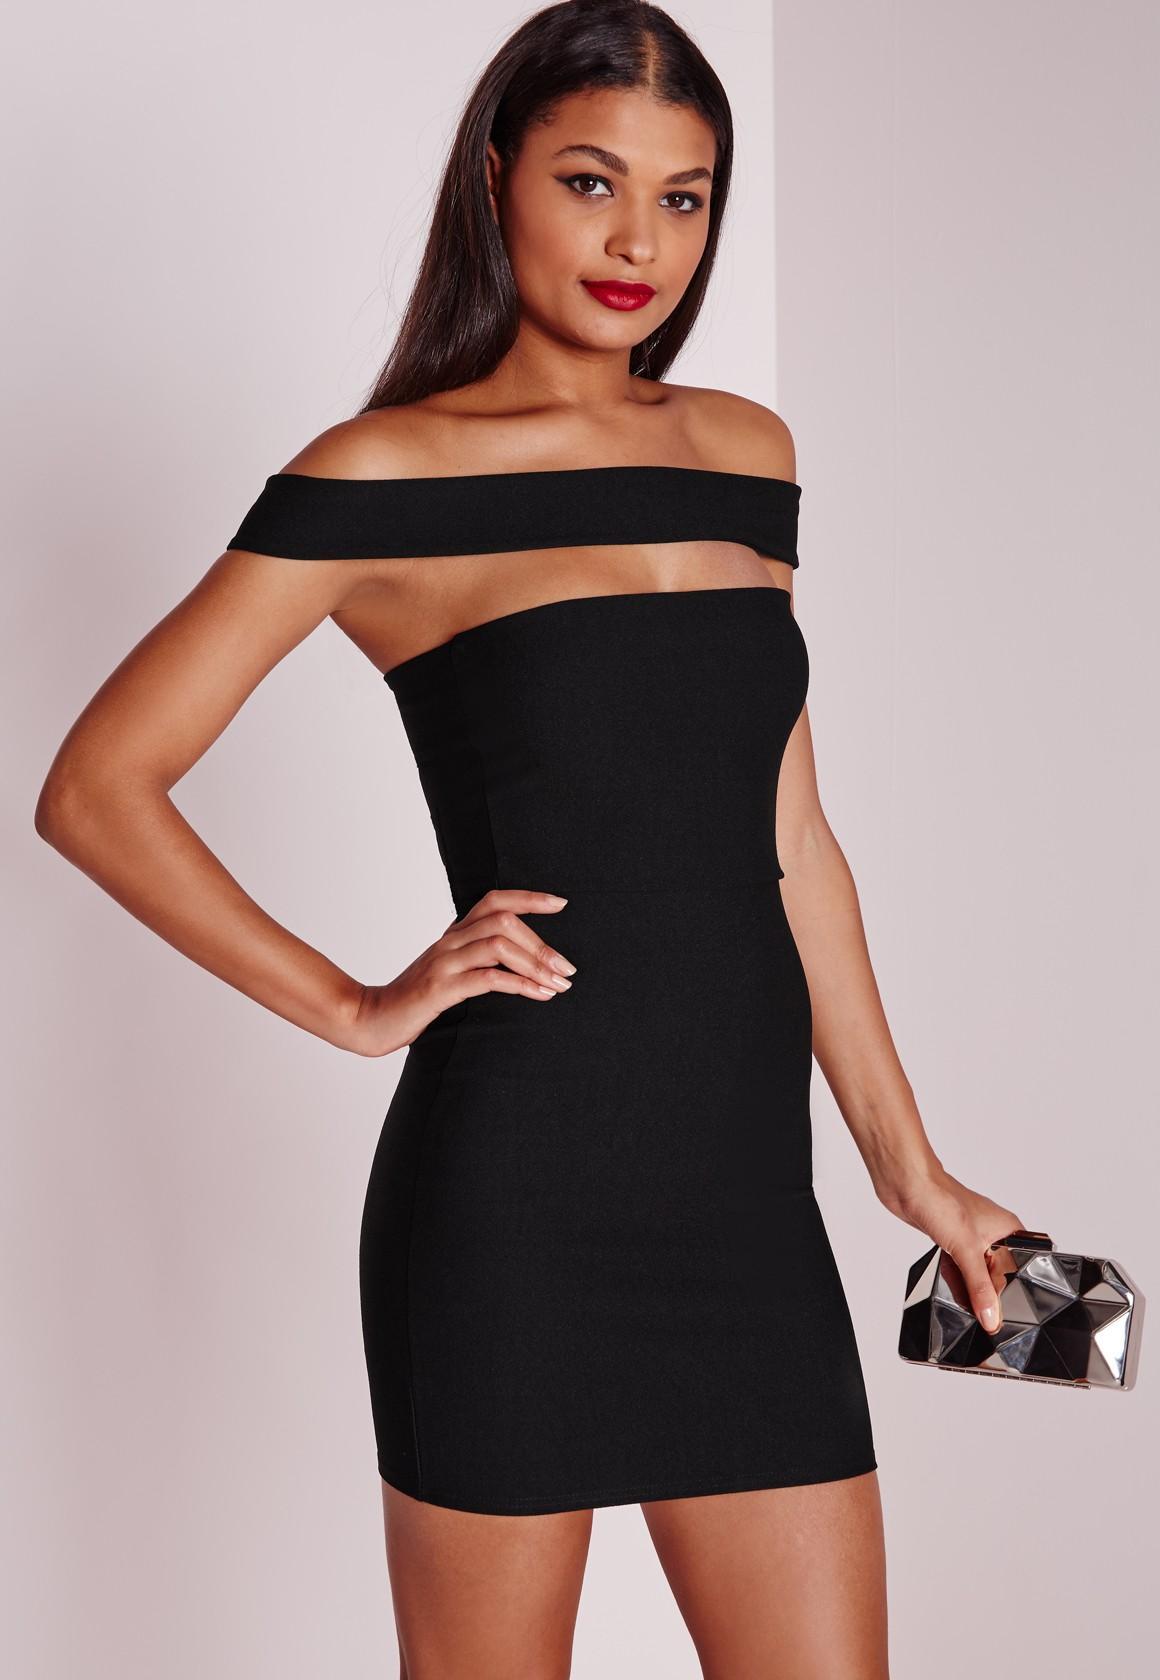 Where to Buy Black Boob Tube Dresses Online? Where Can I Buy Black ...